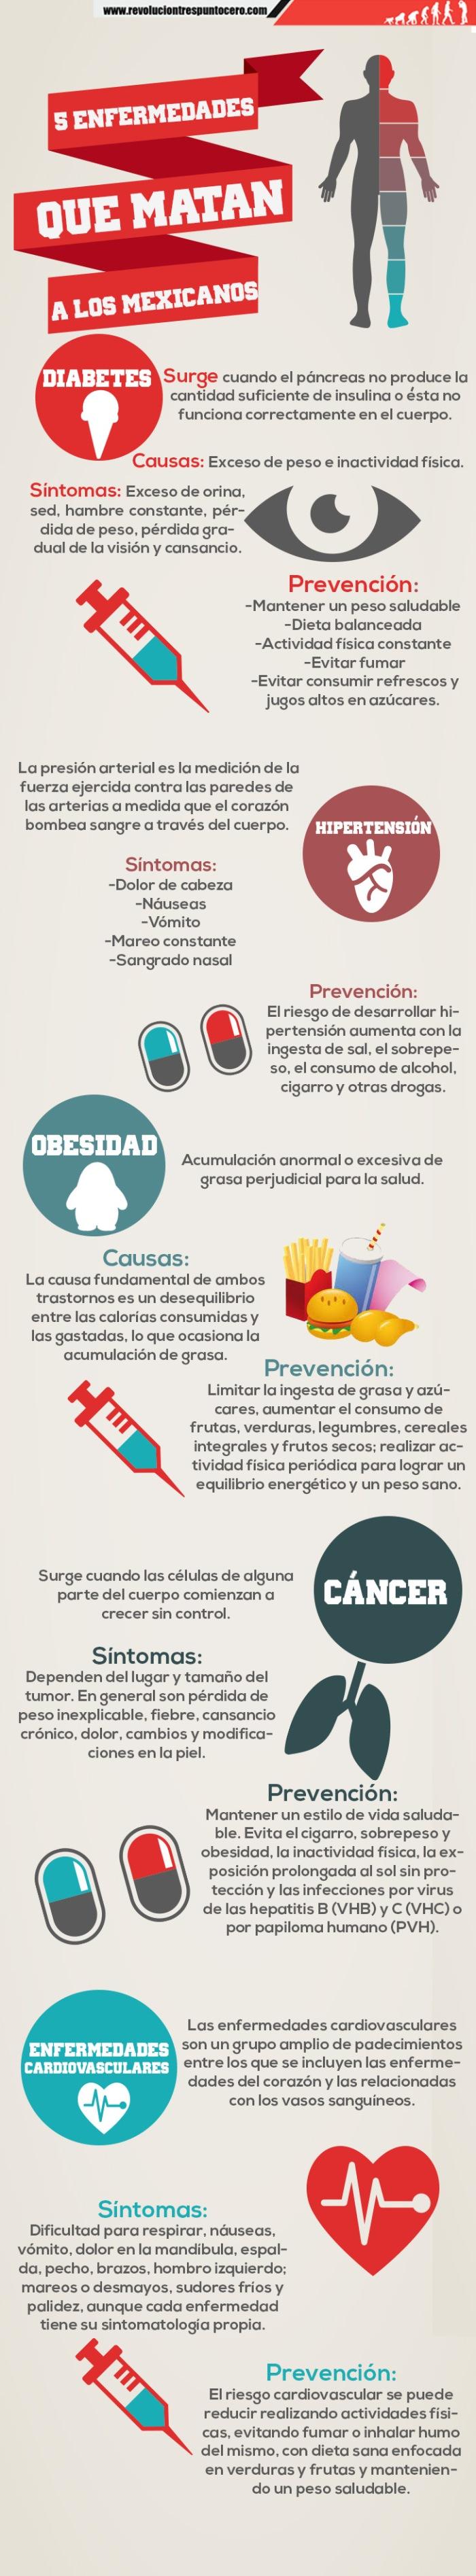 5 enfermedades que matan a los mexicanos